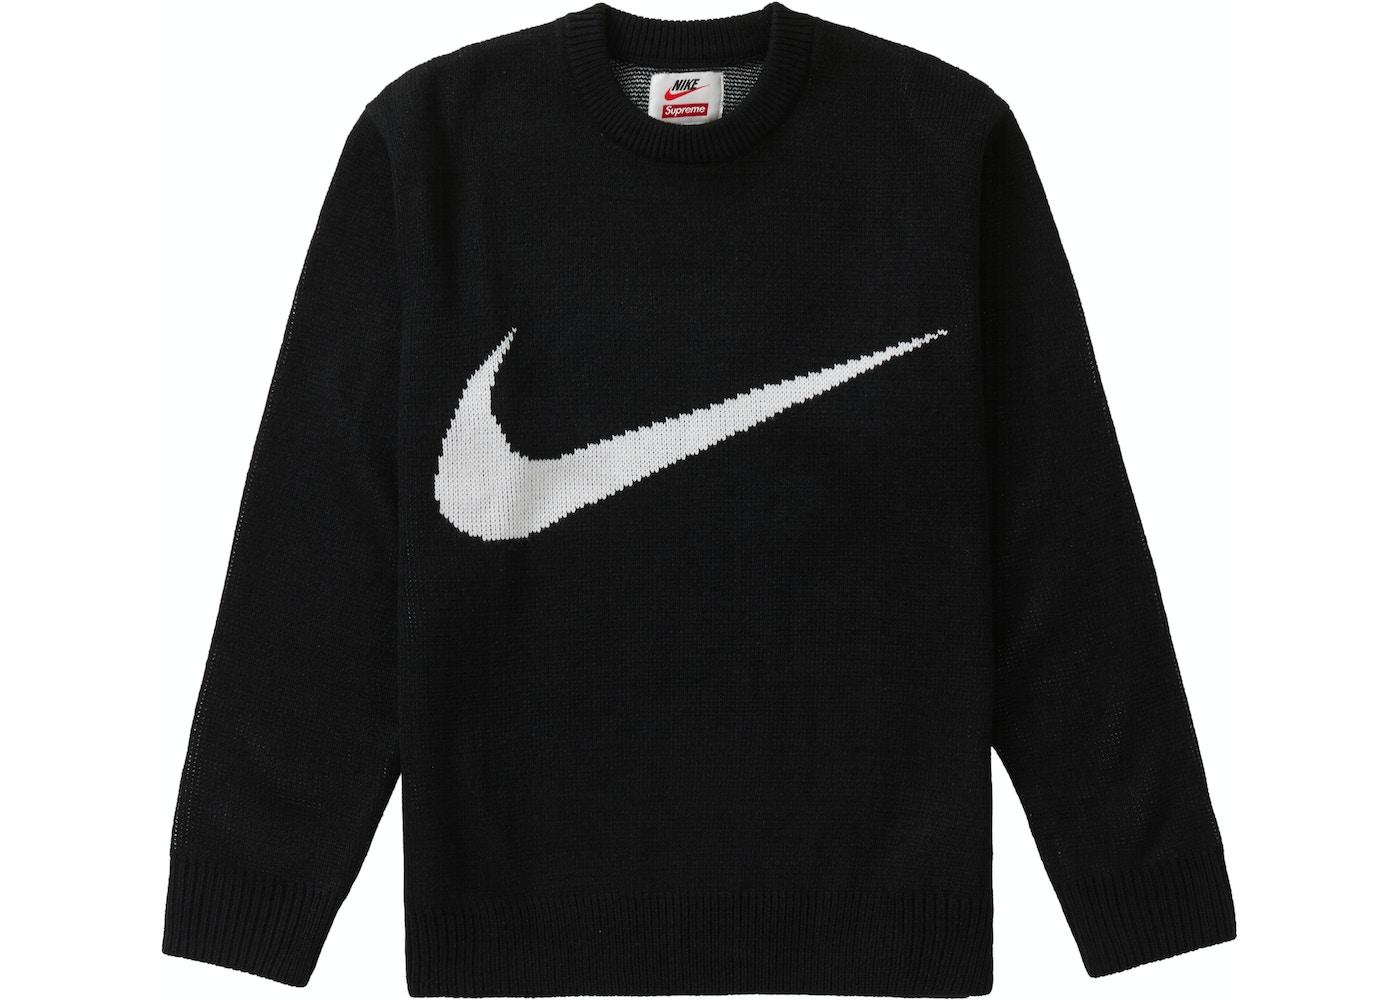 gamma completa di articoli migliori scarpe da ginnastica scarpe eleganti Supreme Nike Swoosh Sweater Black - SS19